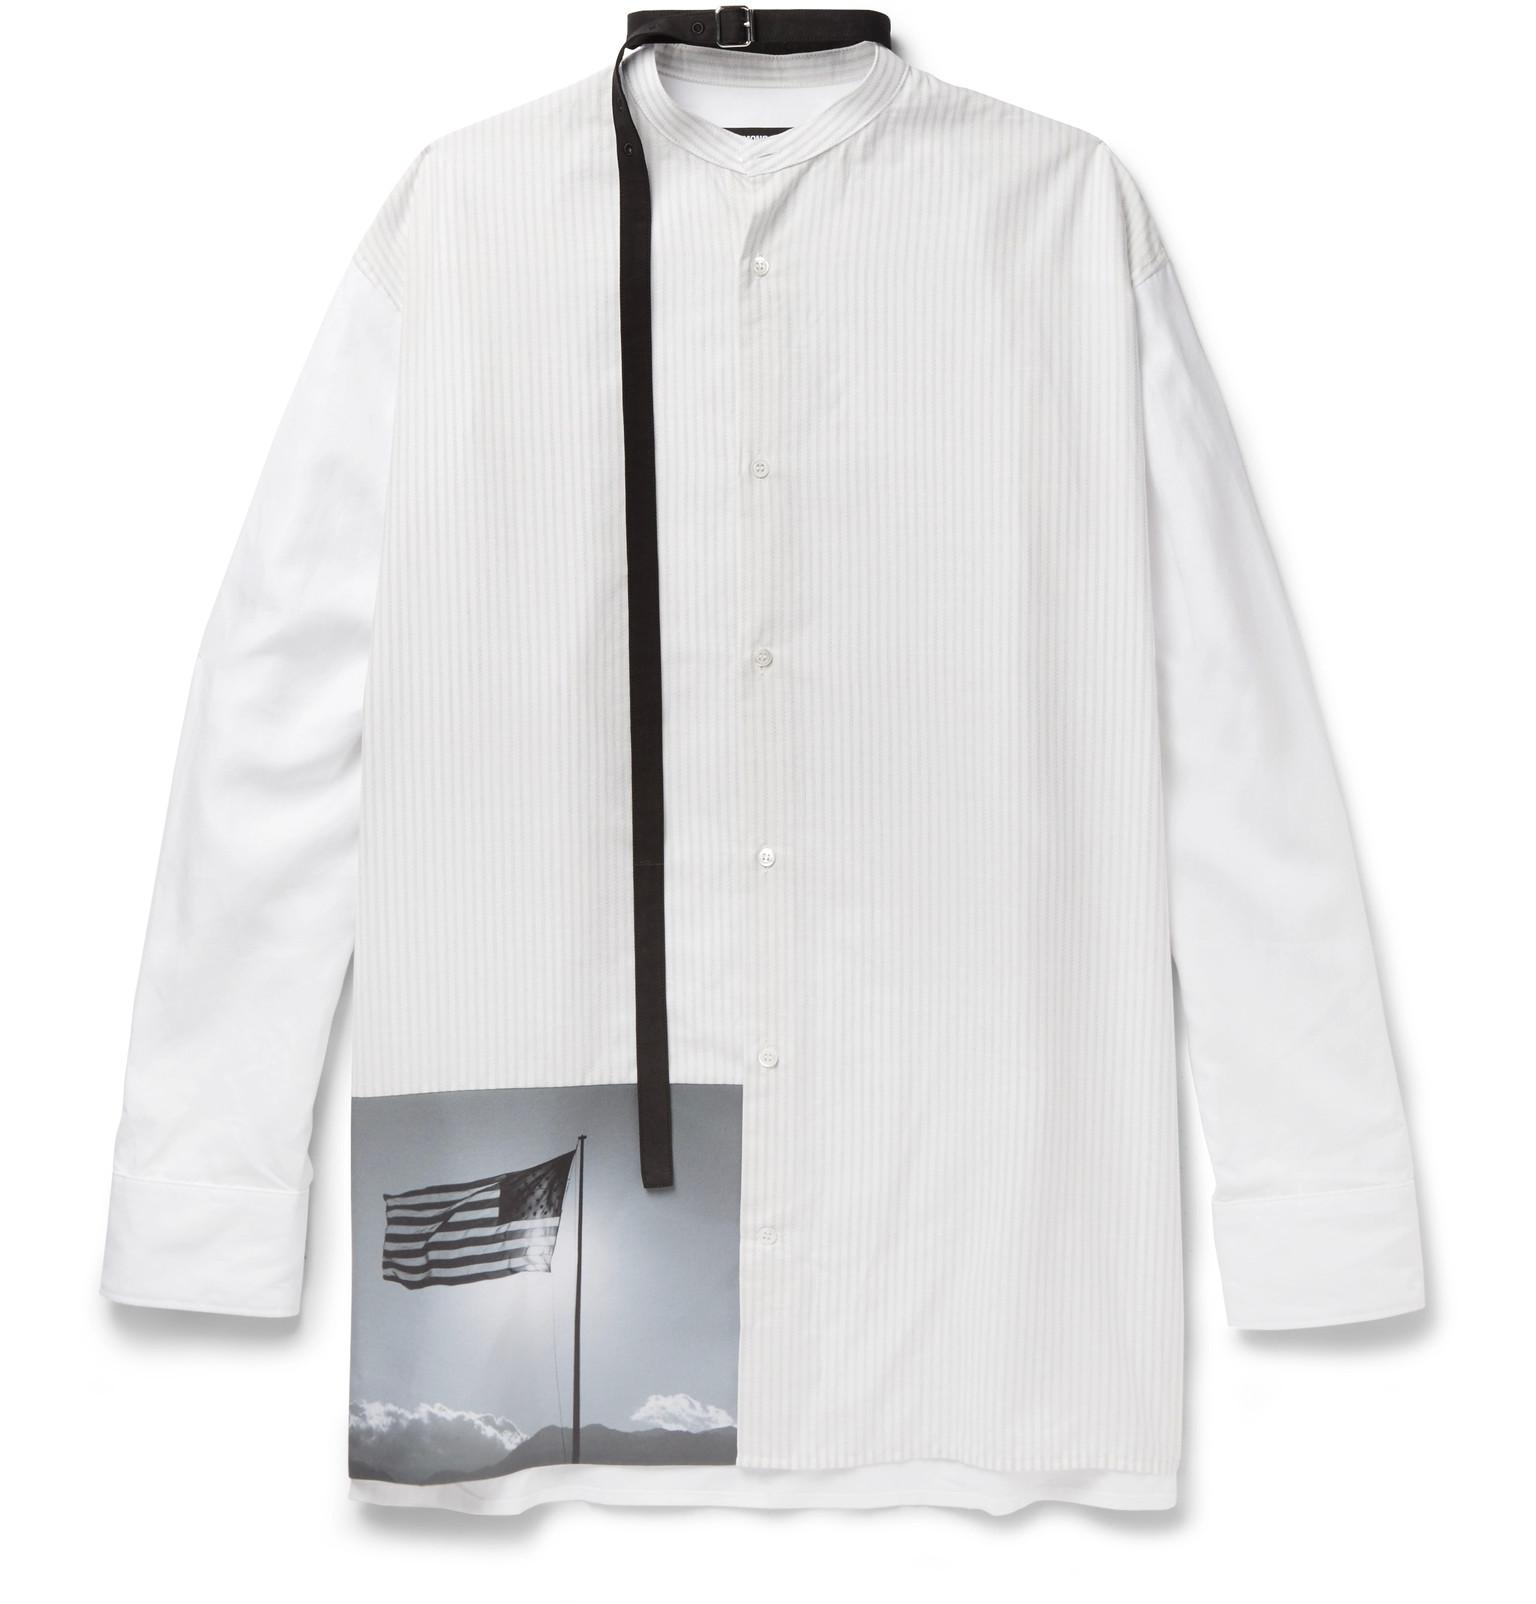 Raf simons robert mapplethorpe foundation strap detailed for Raf simons robert mapplethorpe shirt